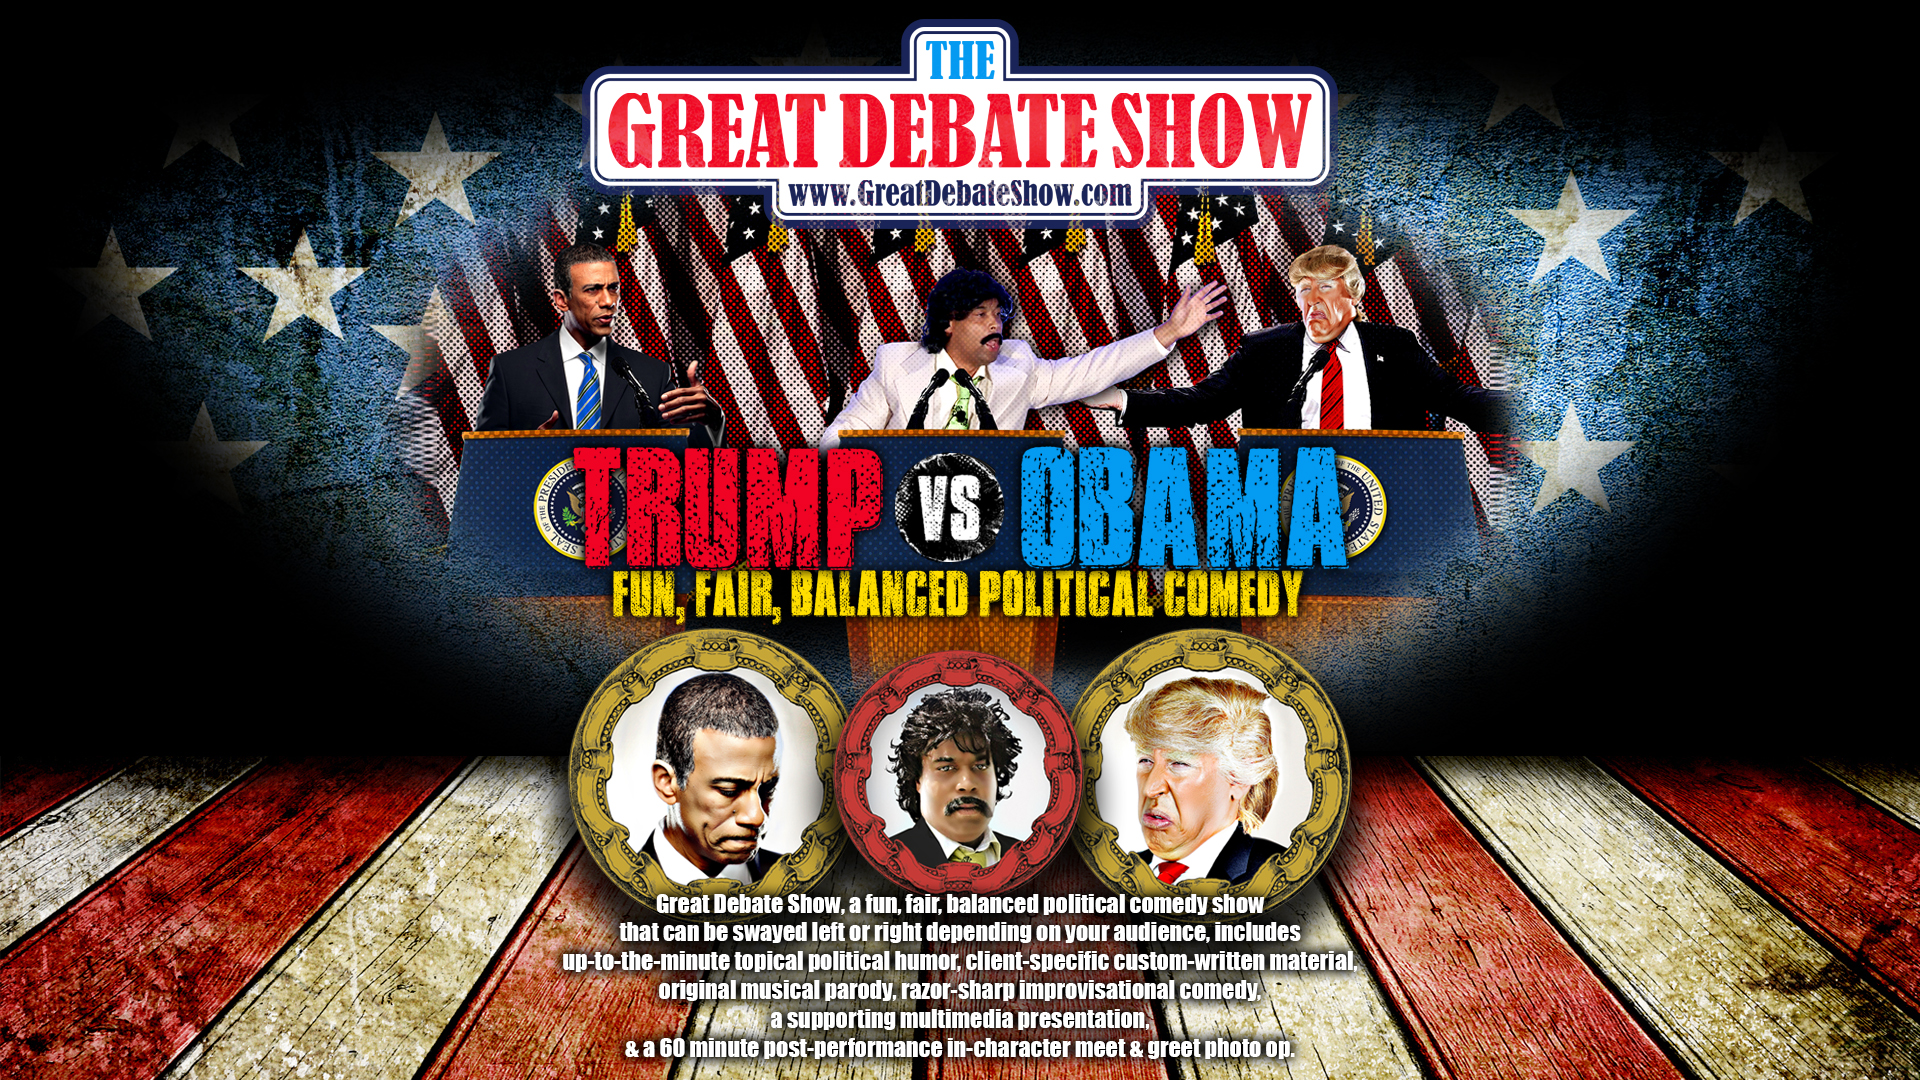 The-Great-Debate-Poster-1920x1080-72dpi-Agent-Friendly.jpg